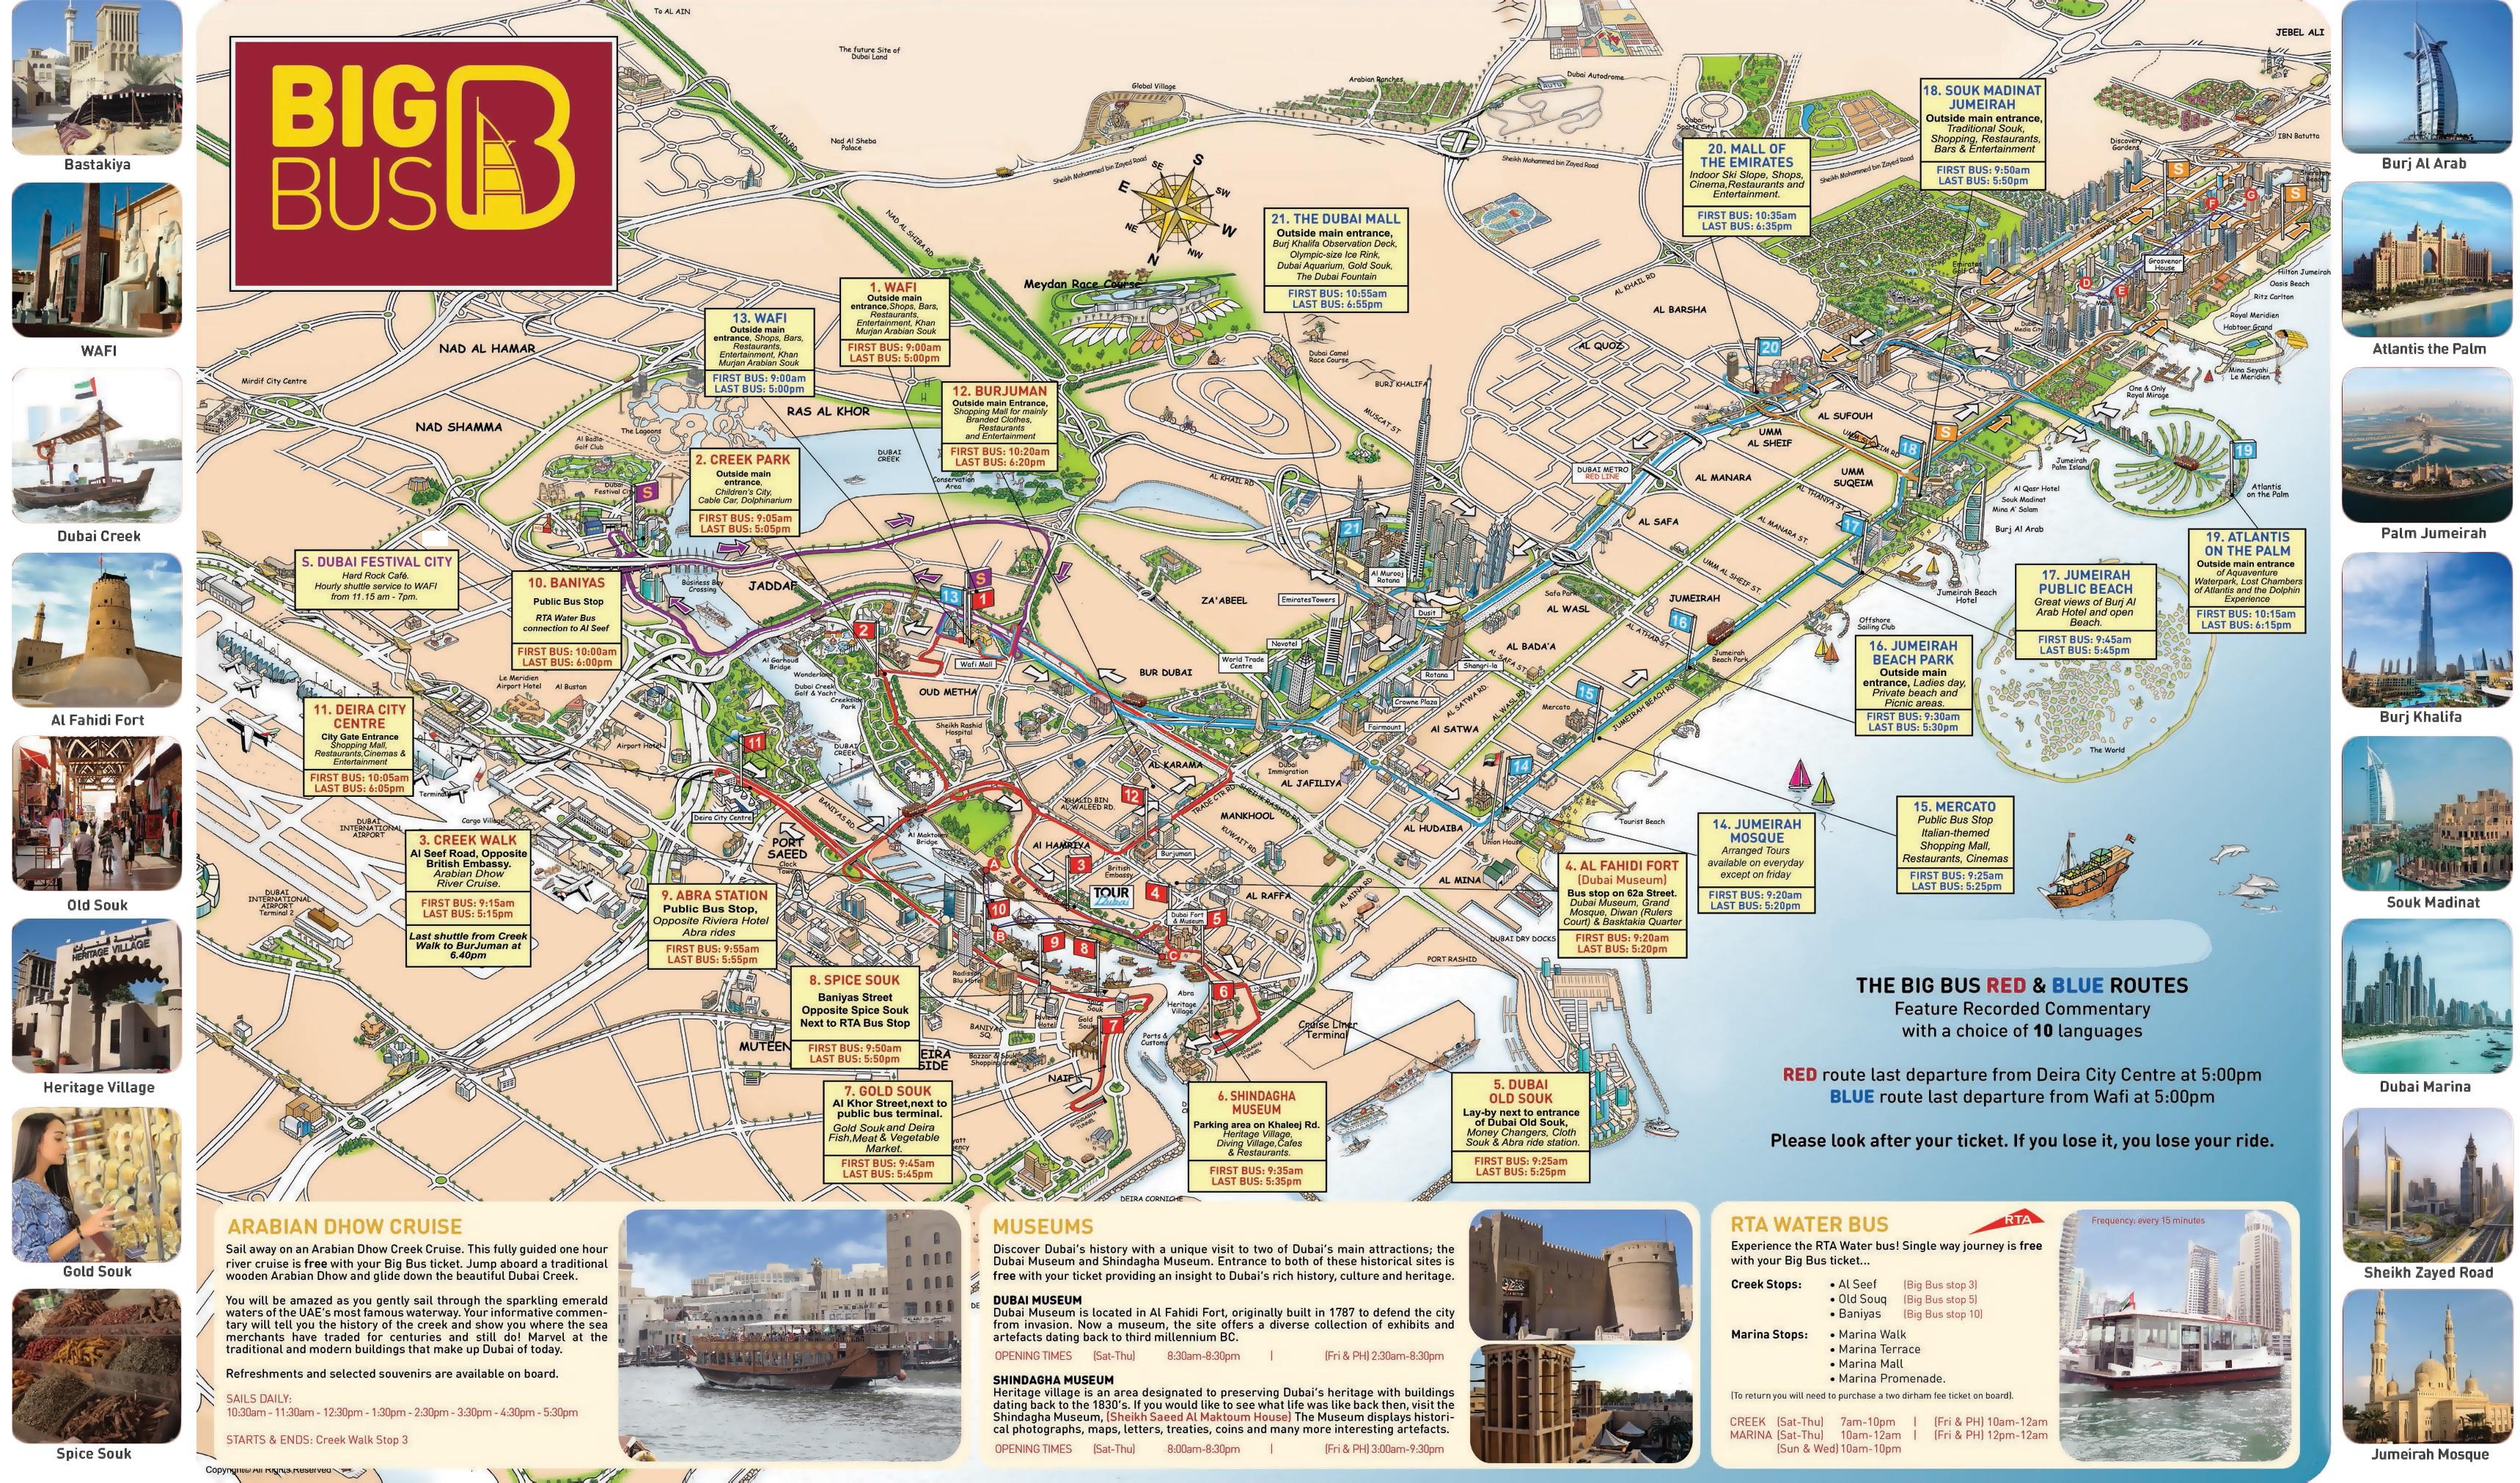 Дубай маршруты автобусов на карте дубай самый высокий дом